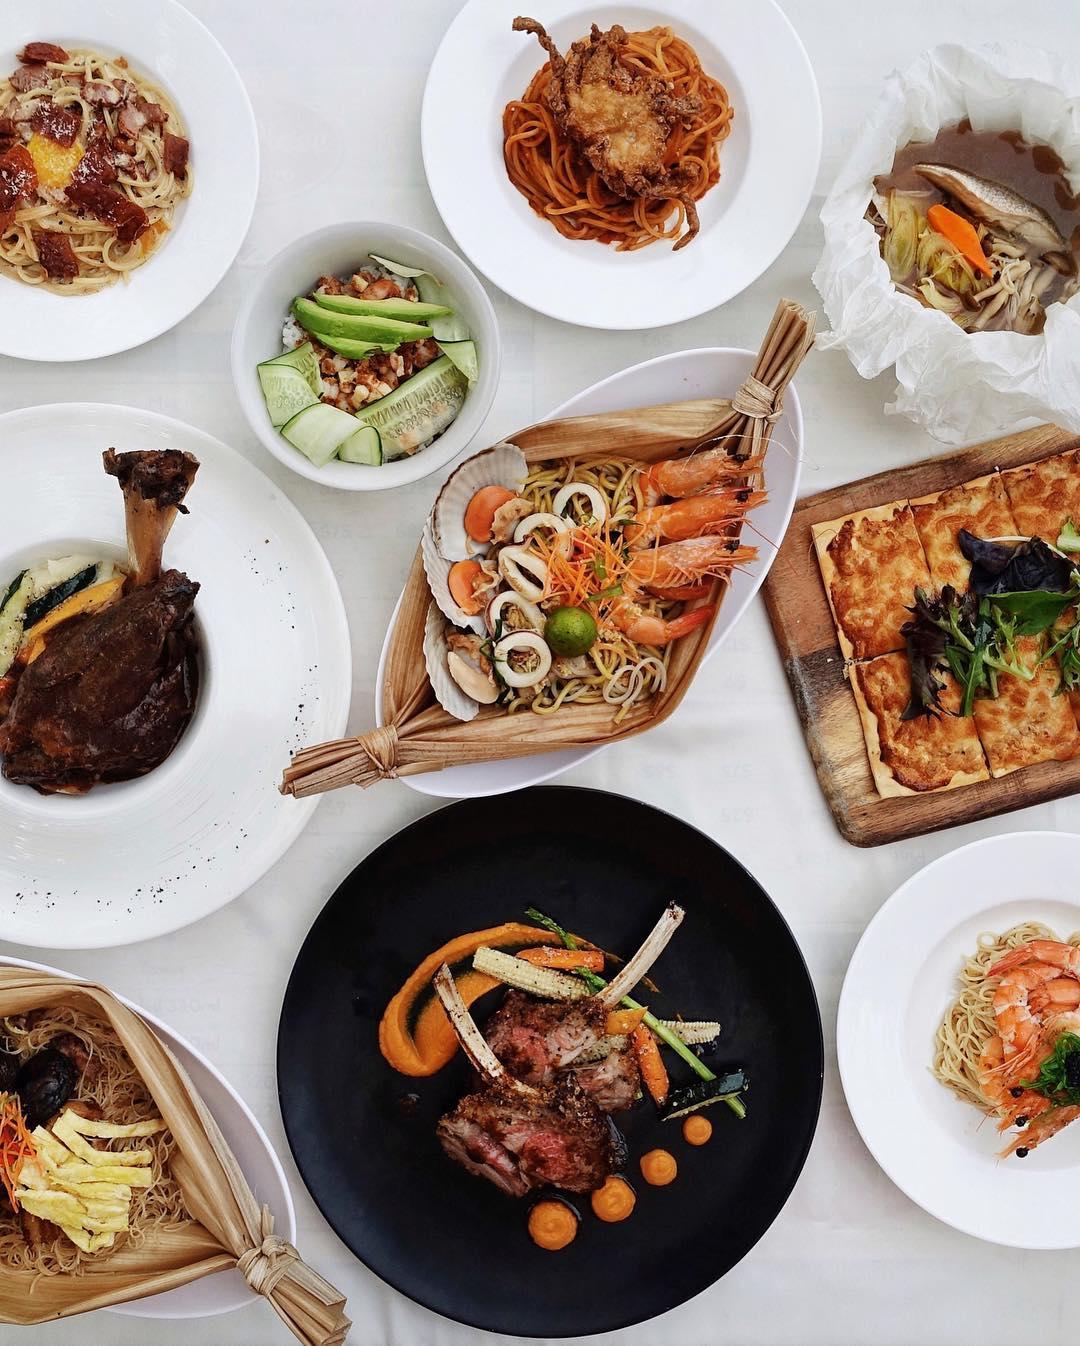 Neighbourhood Cafes Restaurants Singapore Mel's Place Katong Mel's Place Bistro